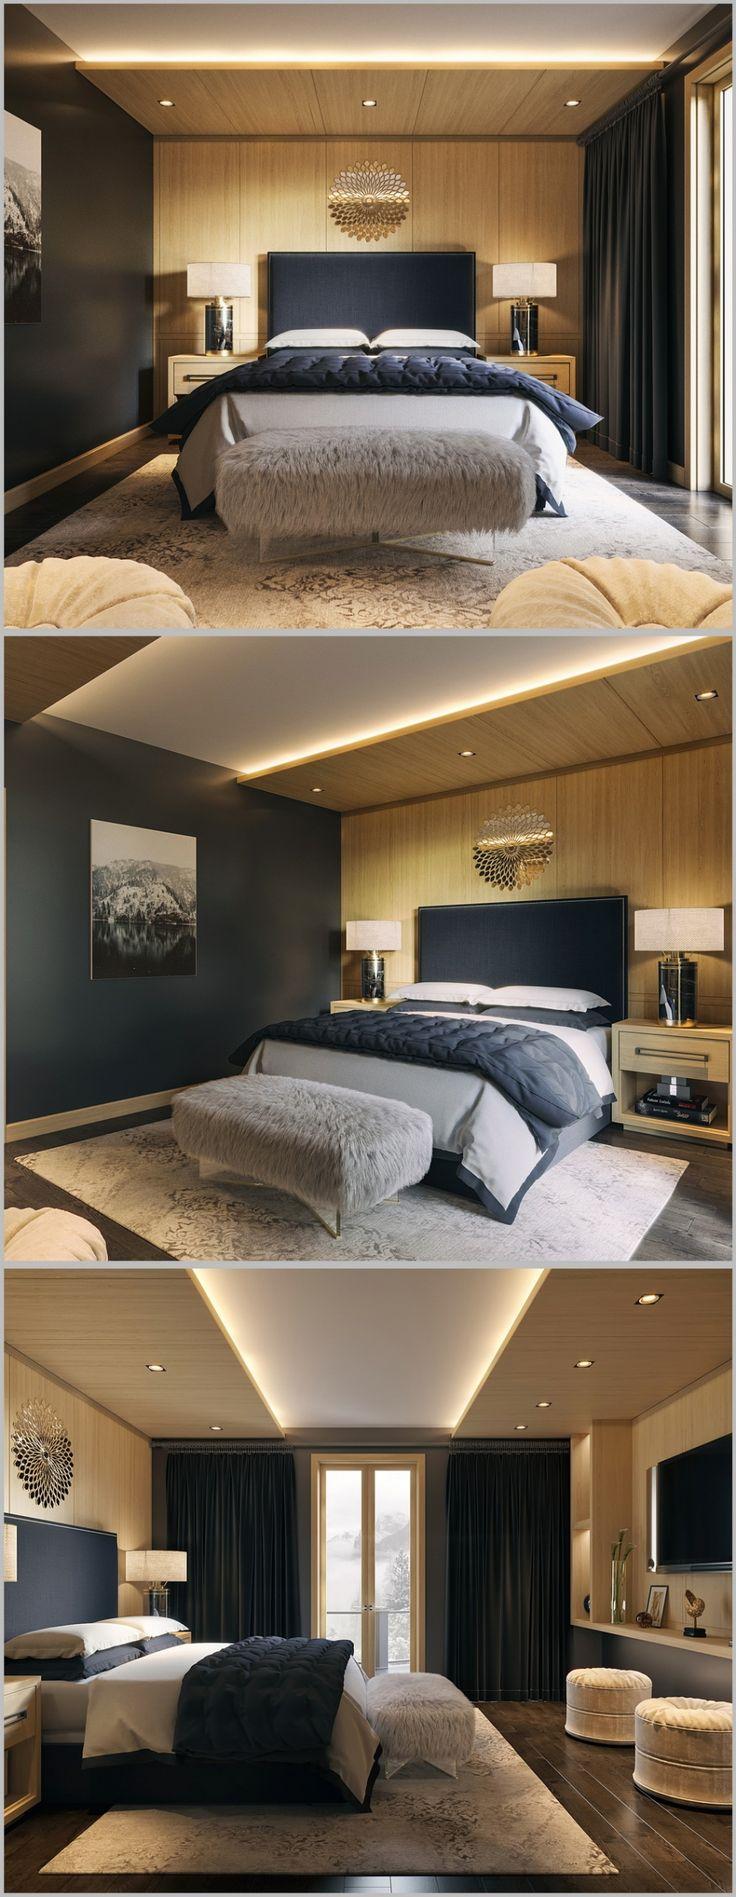 Спальня в гостевом доме - Галерея 3ddd.ru